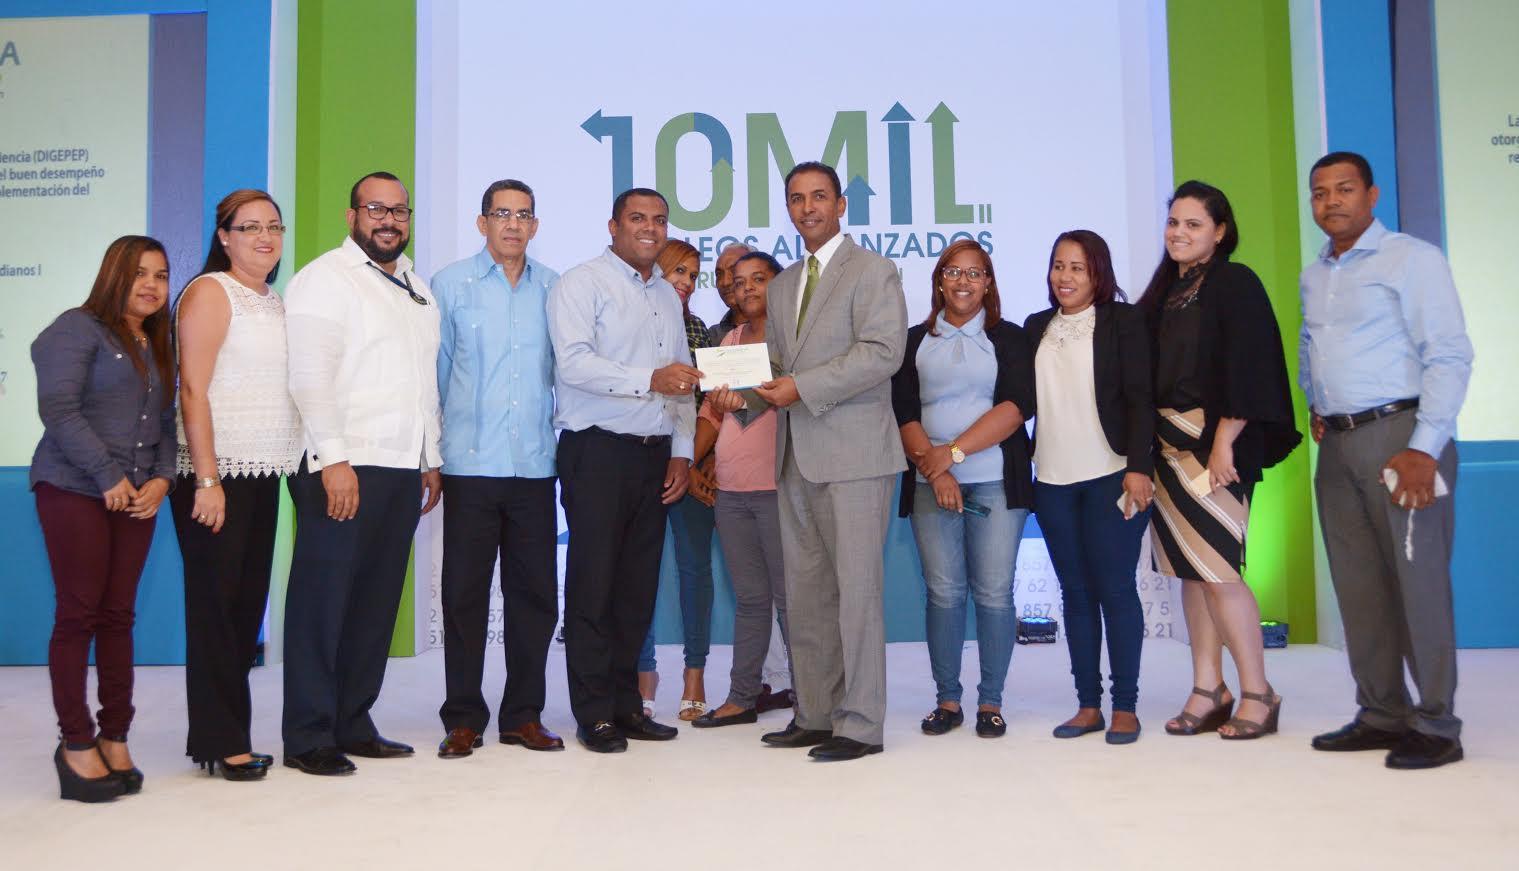 78 mil se inscriben en Plan Nacional de Alfabetización en primer semestre 2017